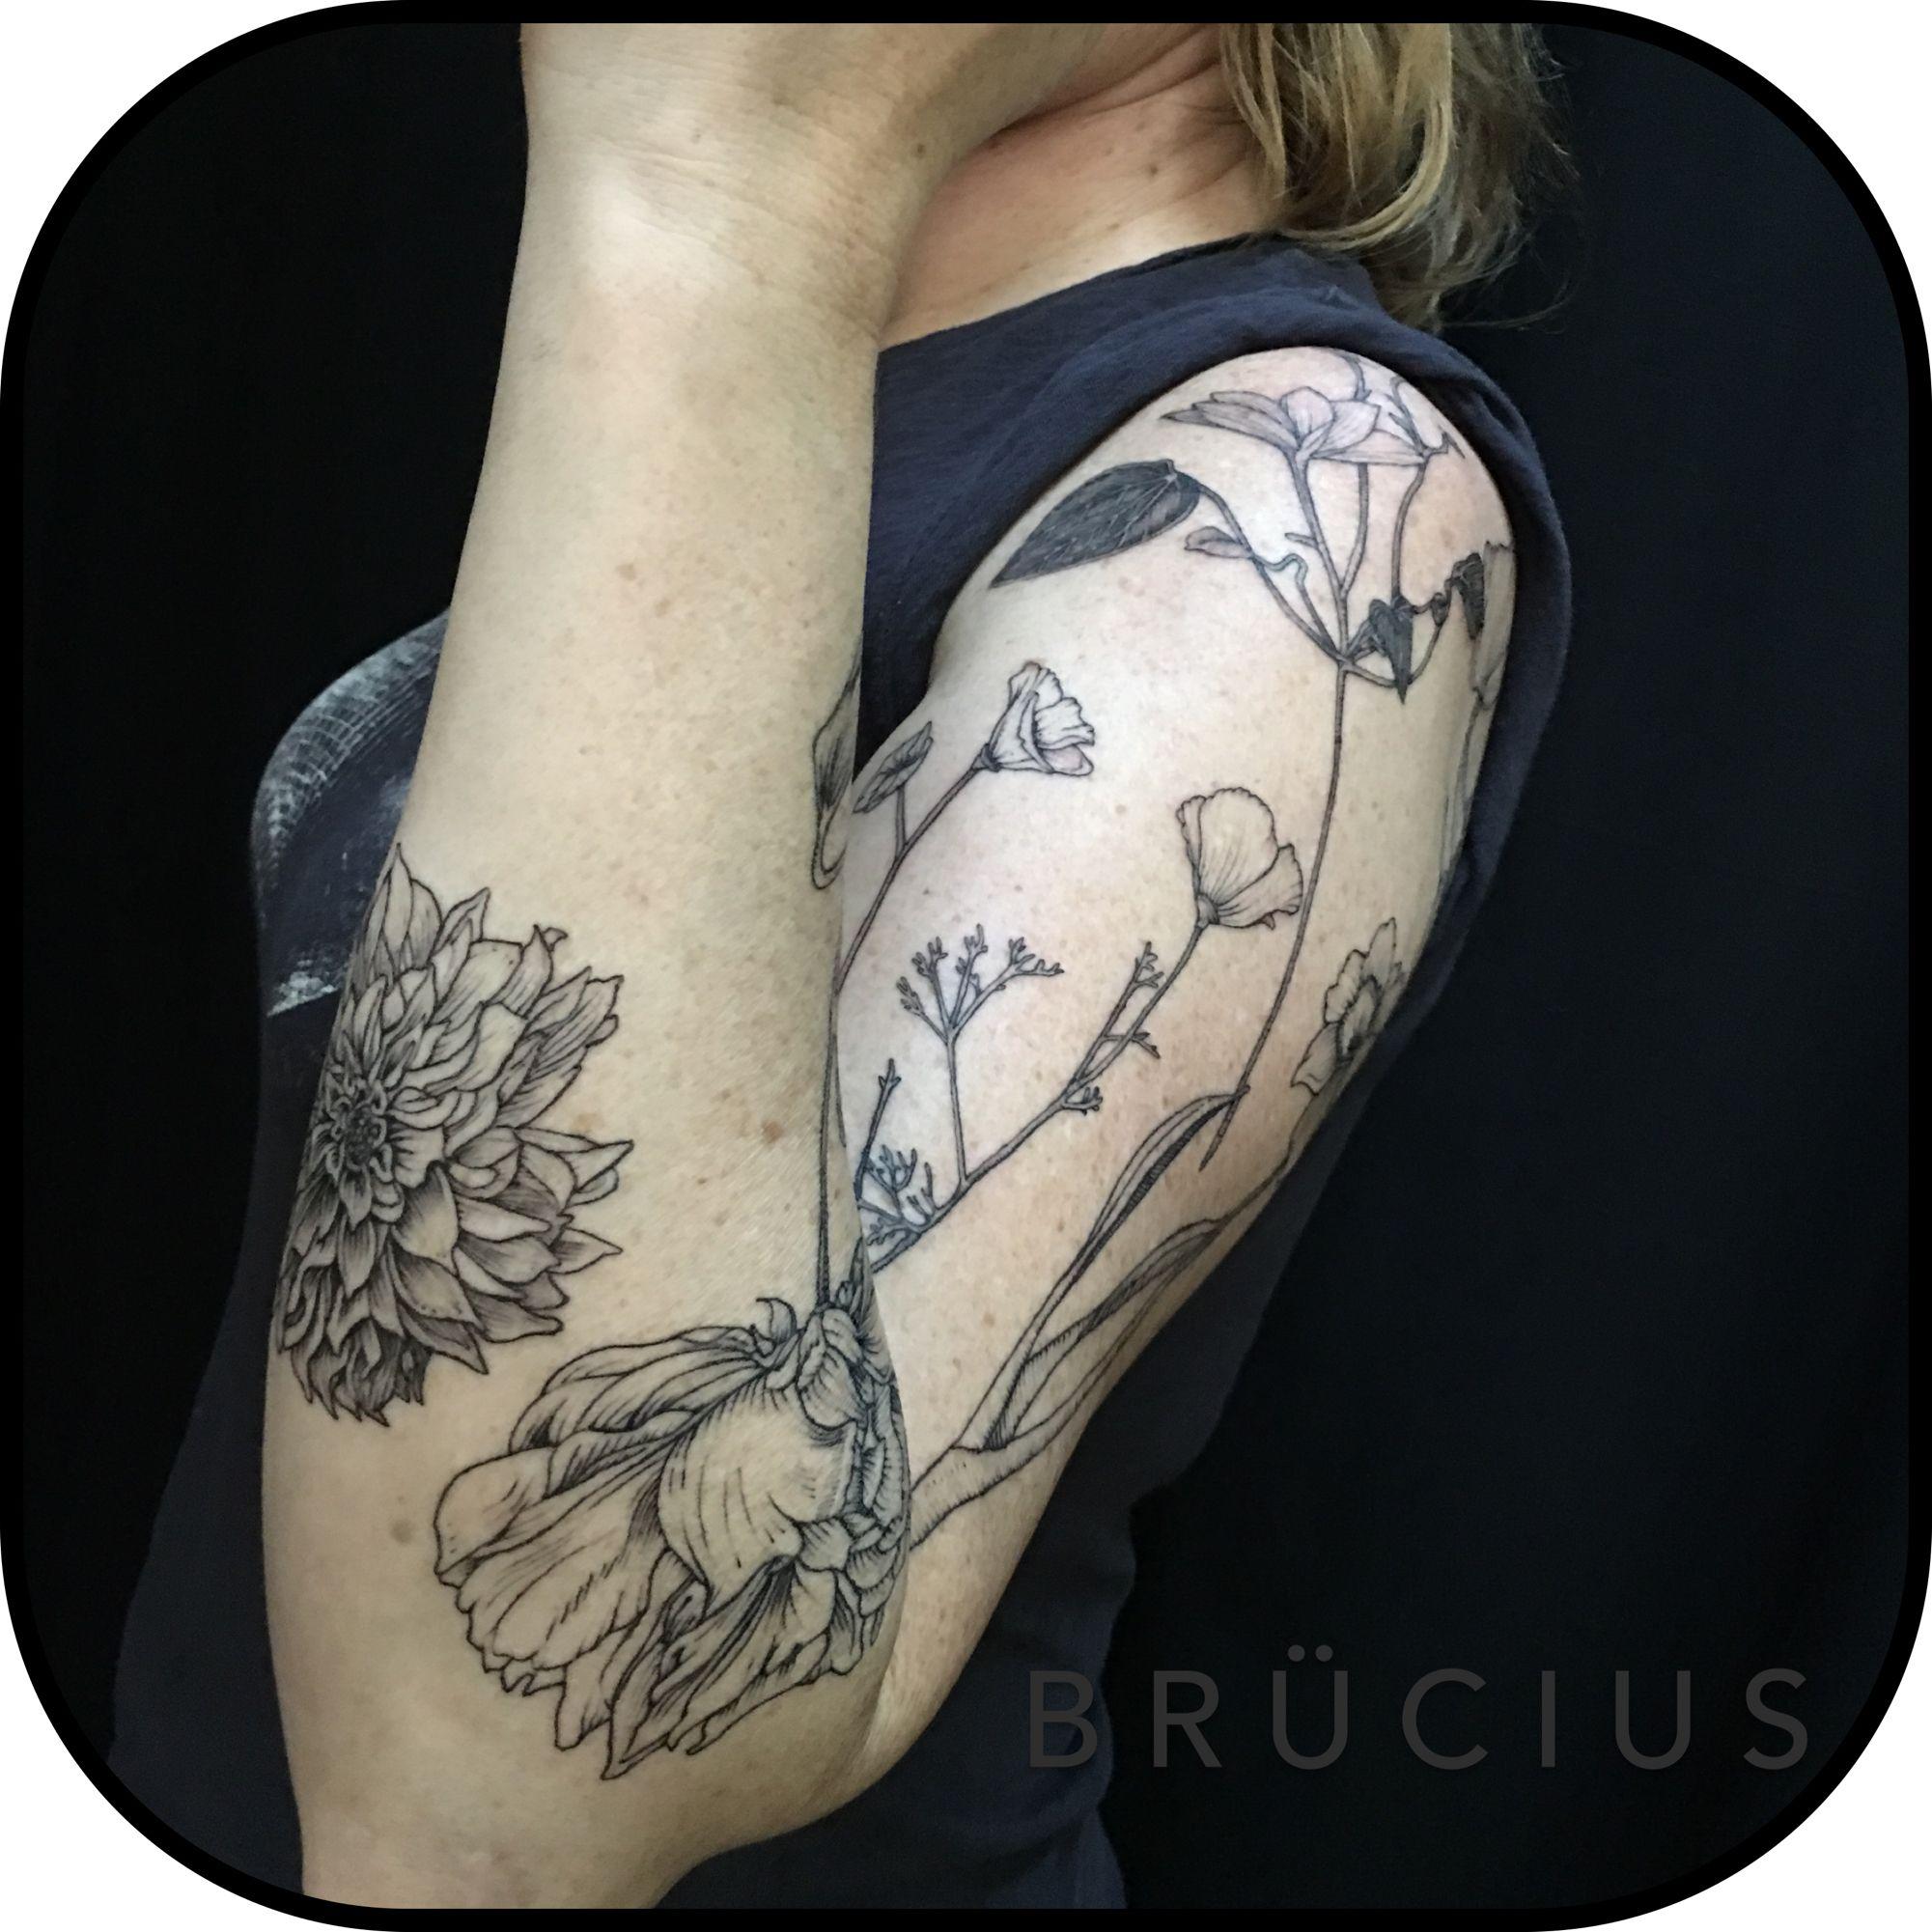 Brucius Tattoo Sanfrancisco Bayareatattoo Sciencetattoo Engravingtattoo Etchingtattoo Sculptoroflines Dotwork Etching Tattoo Tattoos Engraving Tattoo